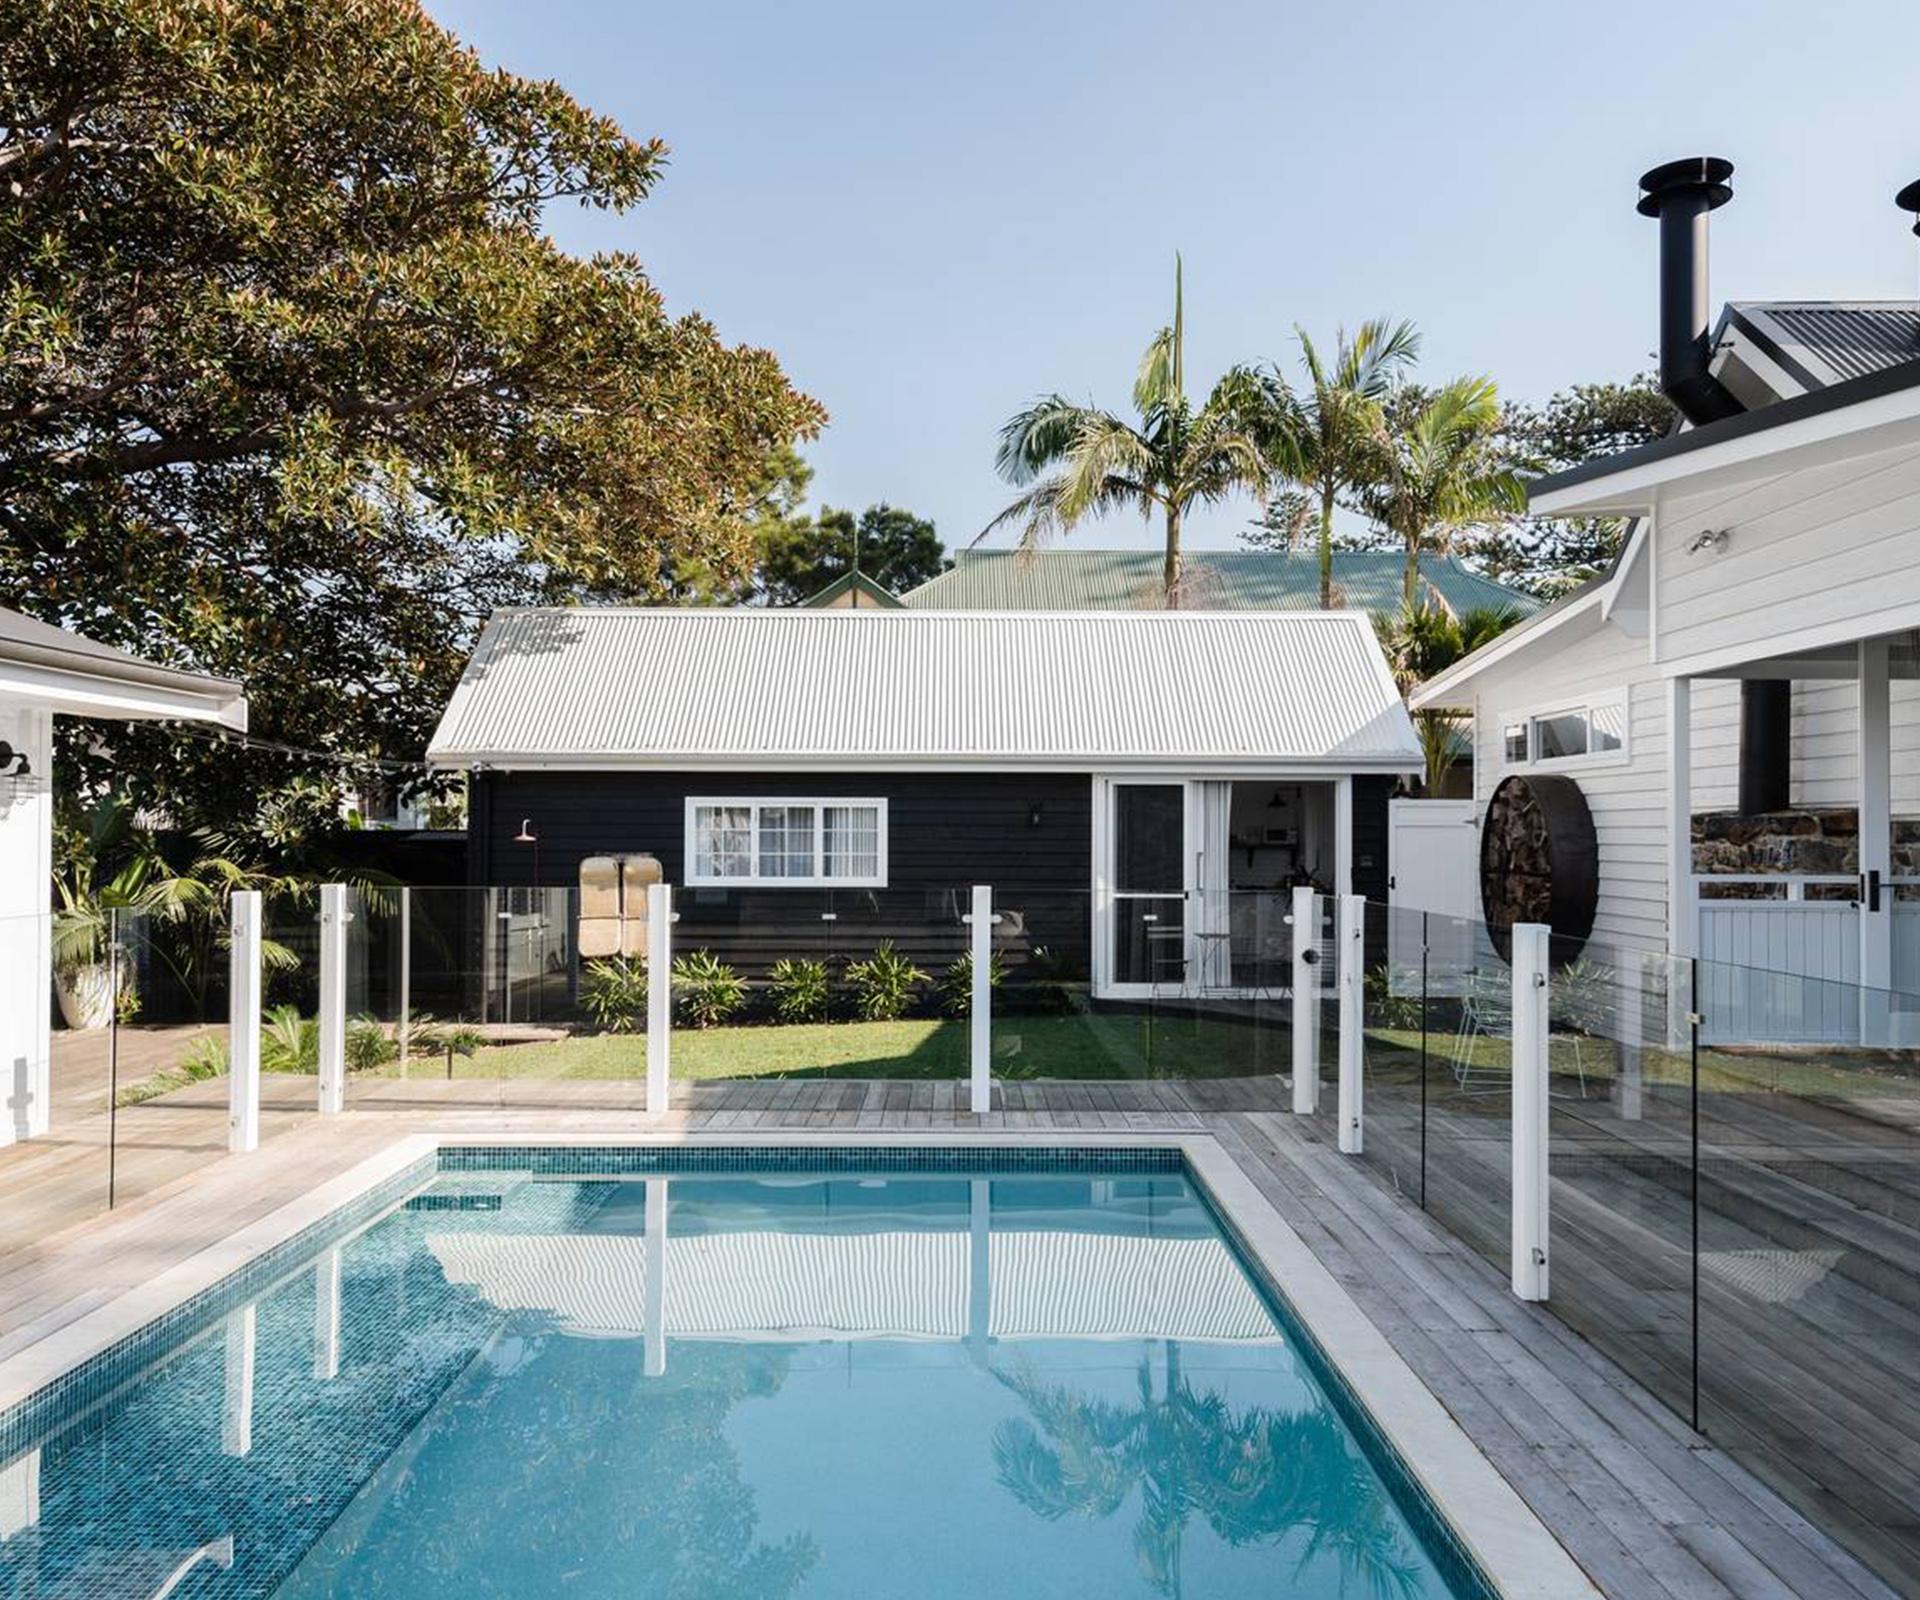 413efaf6ca https   www.homestolove.com.au house-on-a-hill-design-13176 Daily ...